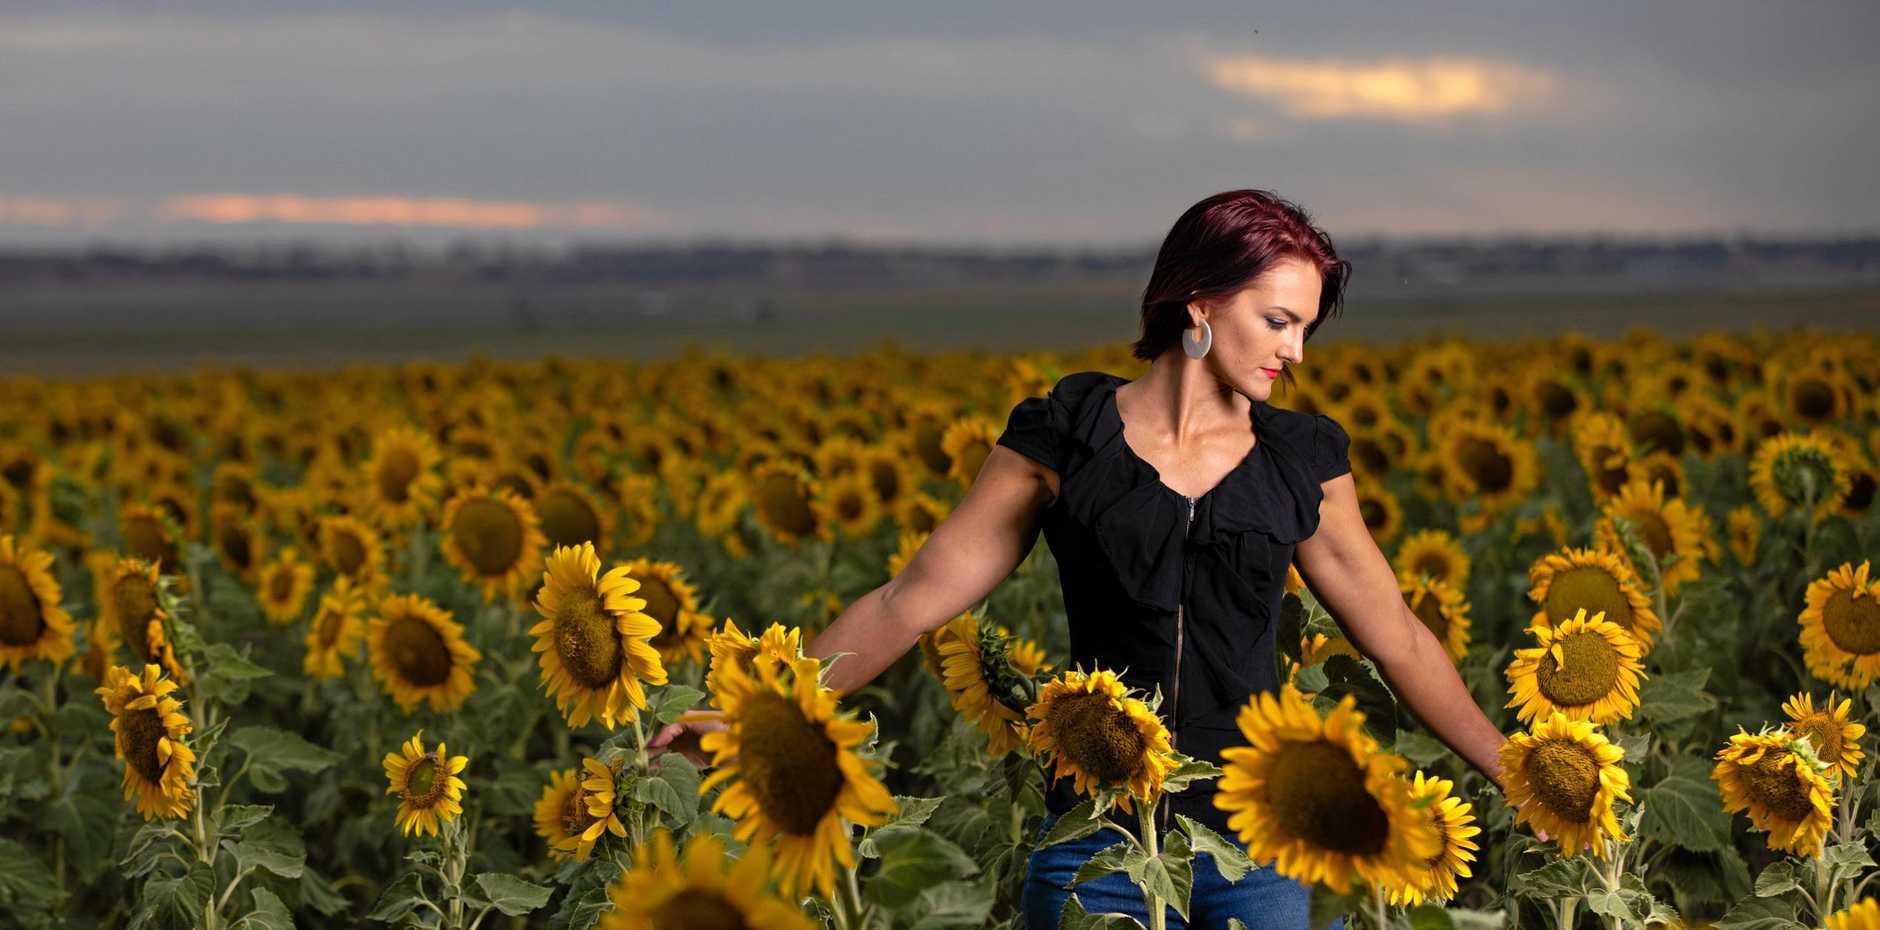 Tim Swinson captured stunning photos of Tamlyn Wolfenden amongst a sunflower field in Oakey.